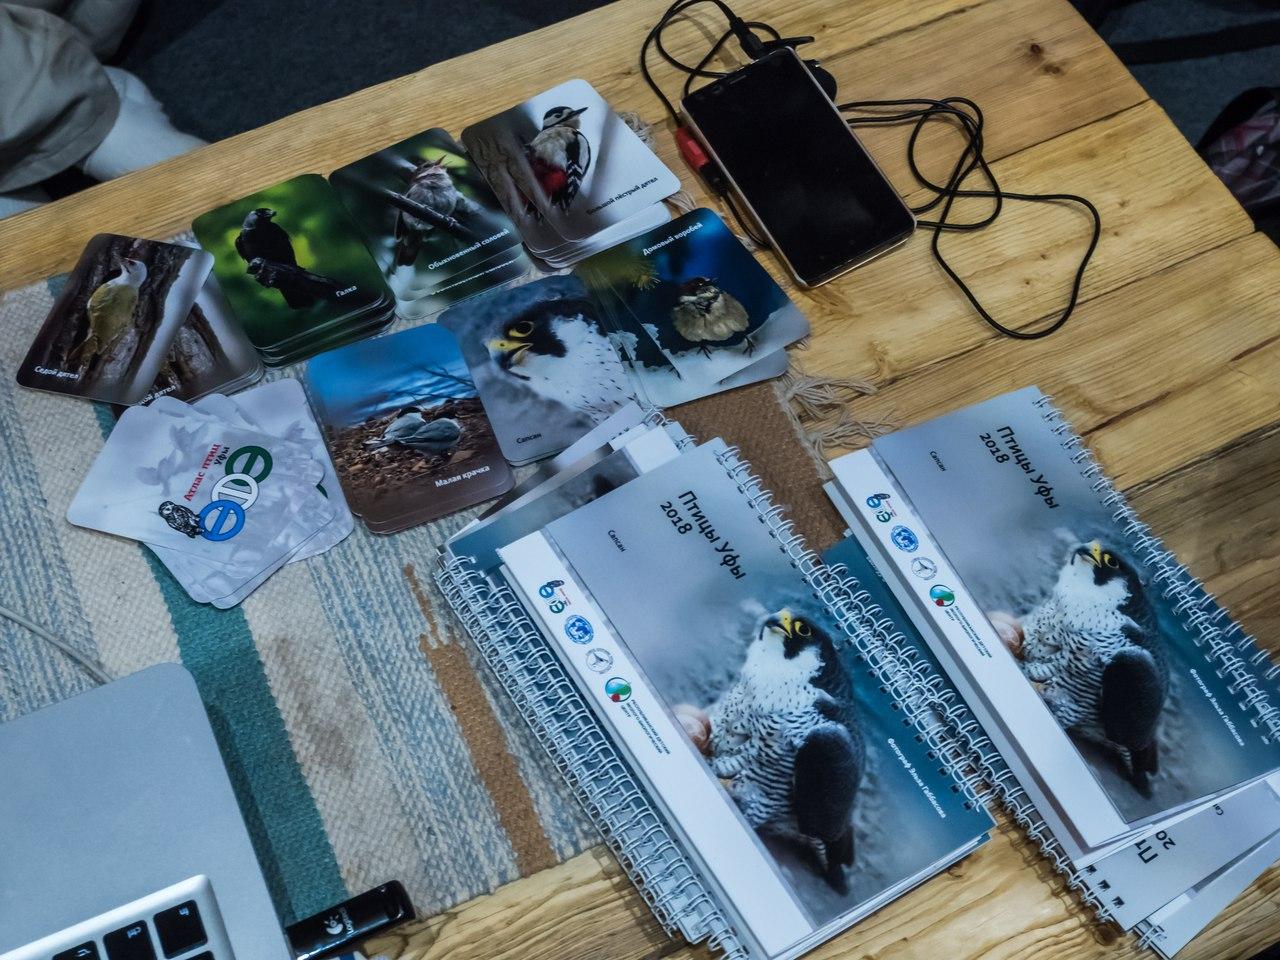 Календари от проекта Атласа птиц Уфы